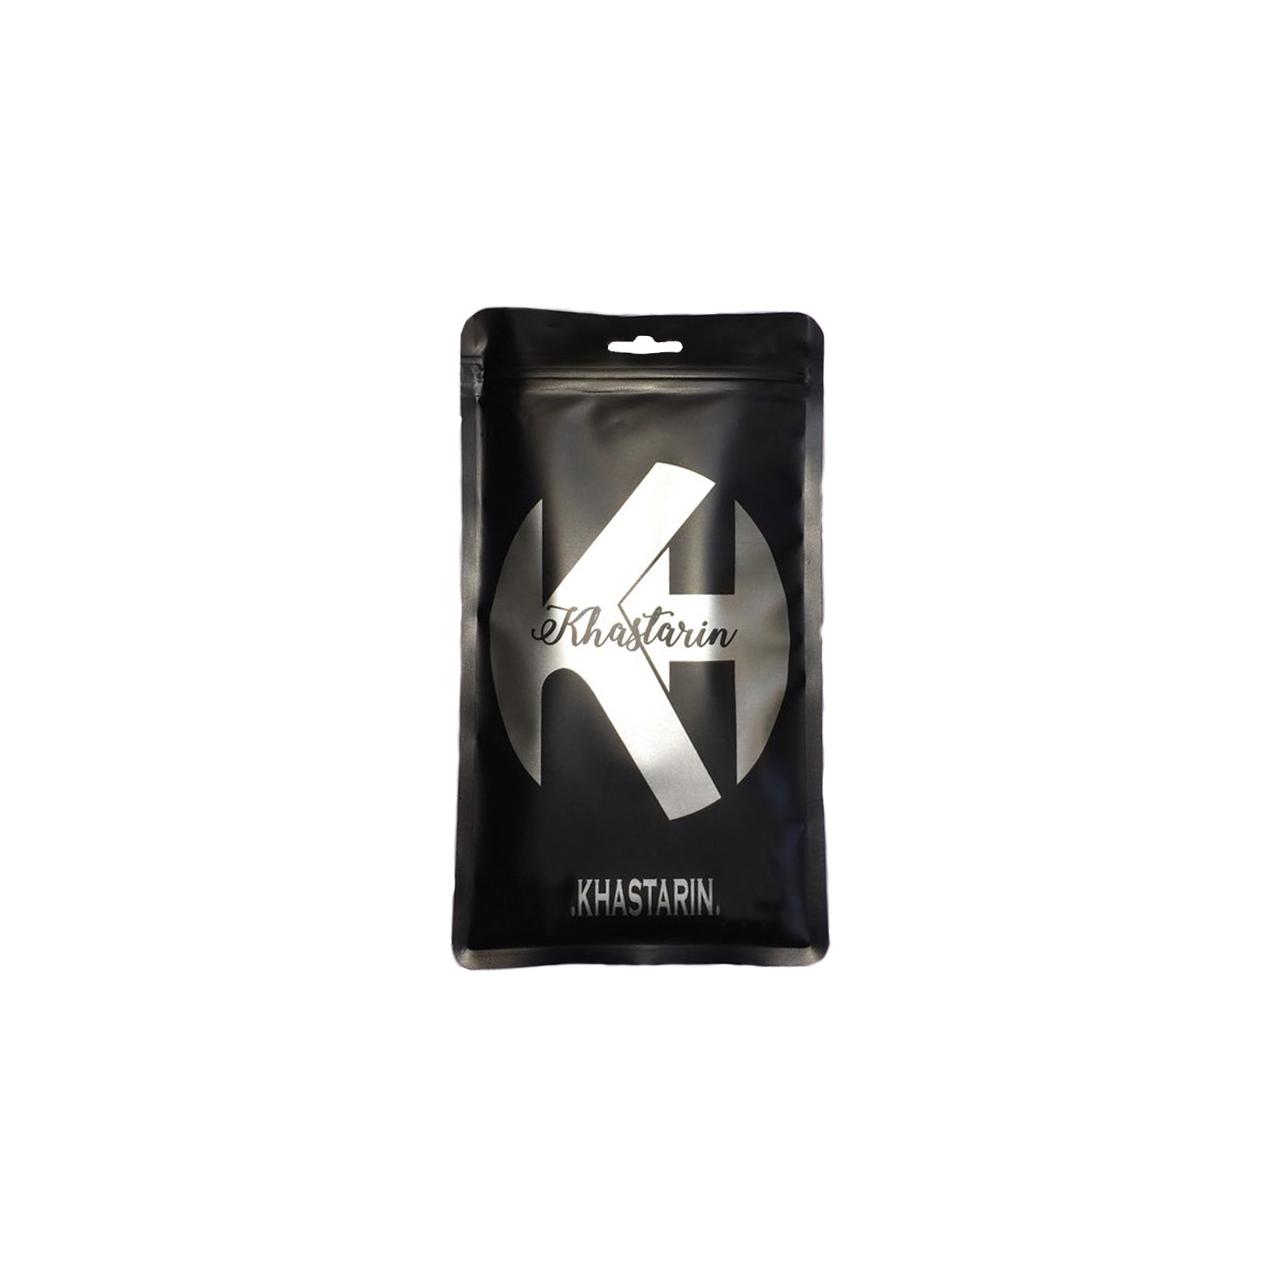 کاور کی اچ کد C20 مناسب برای گوشی موبایل سامسونگ galaxy J710 / J7 2016